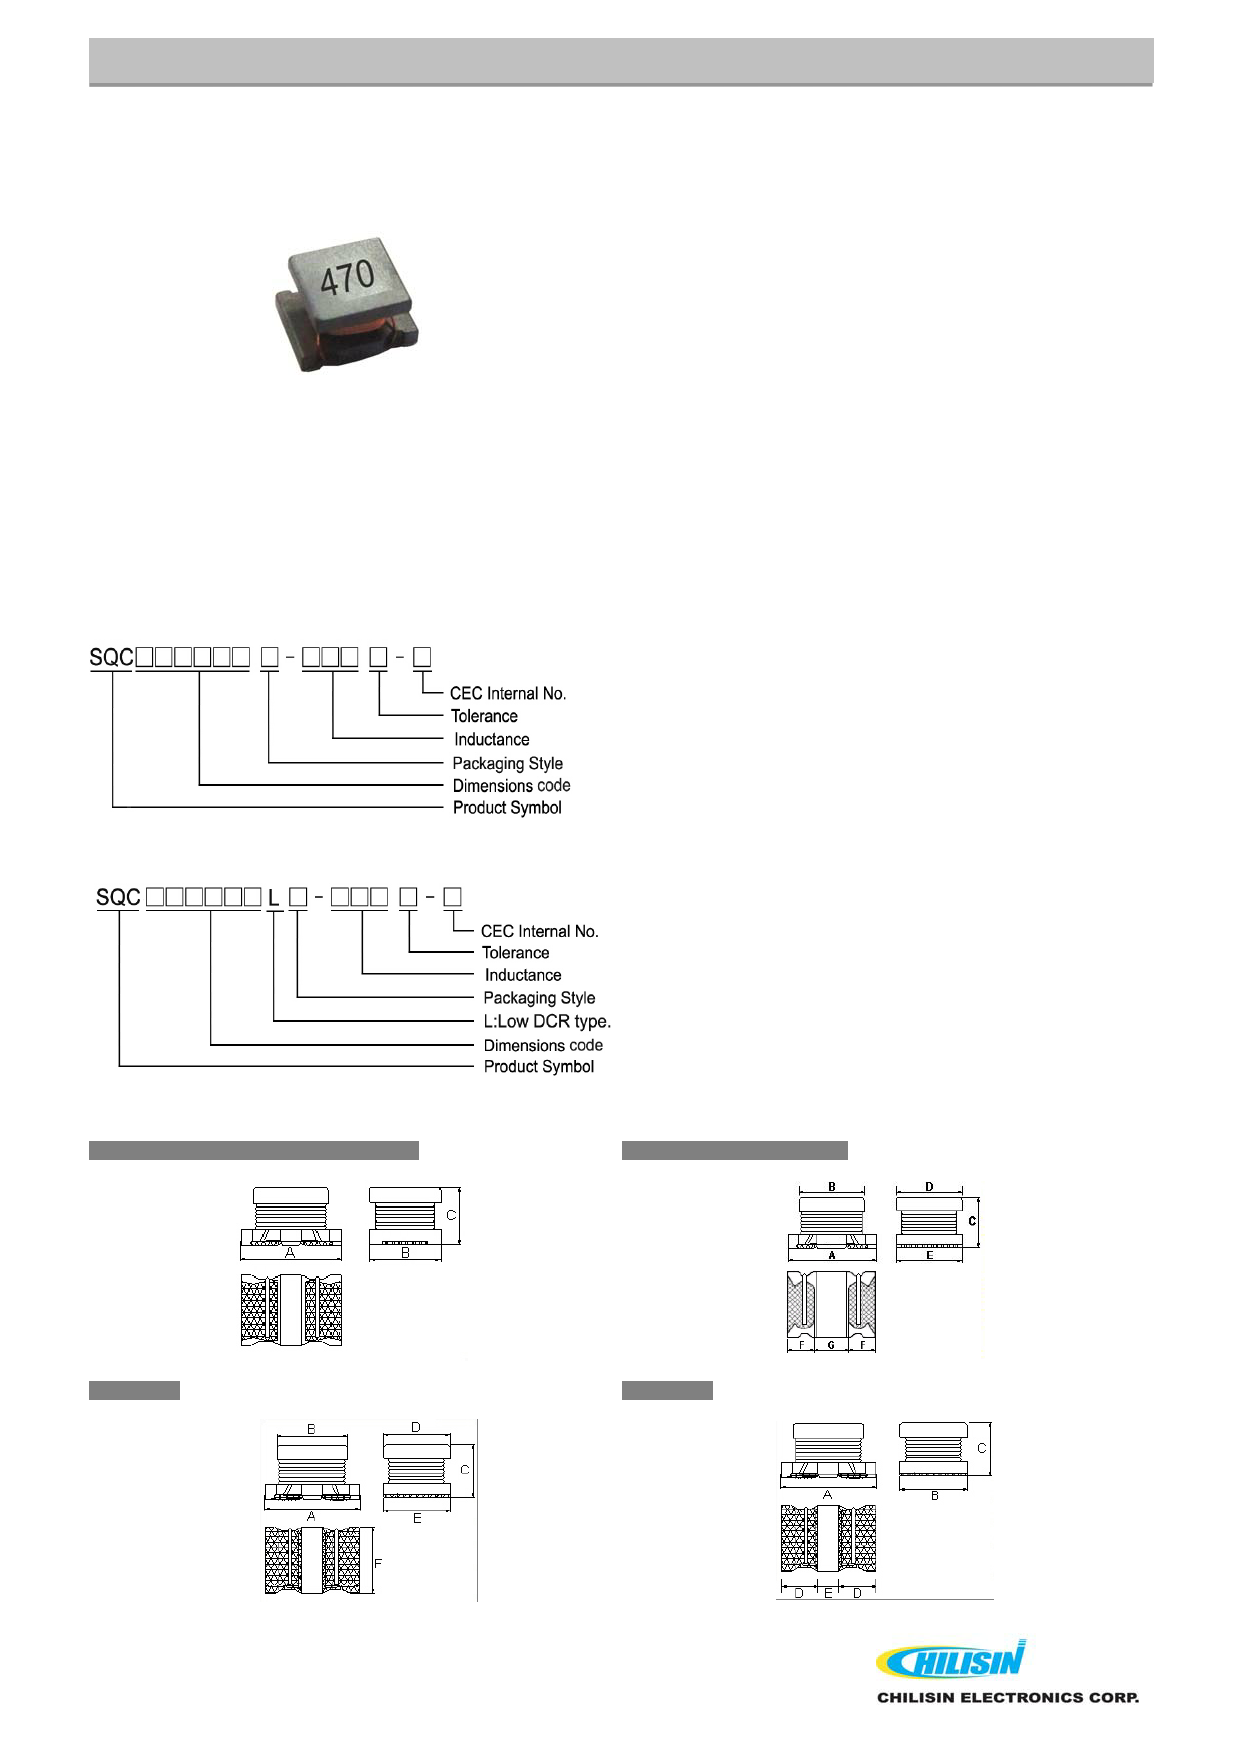 SQC575047 데이터시트 및 SQC575047 PDF